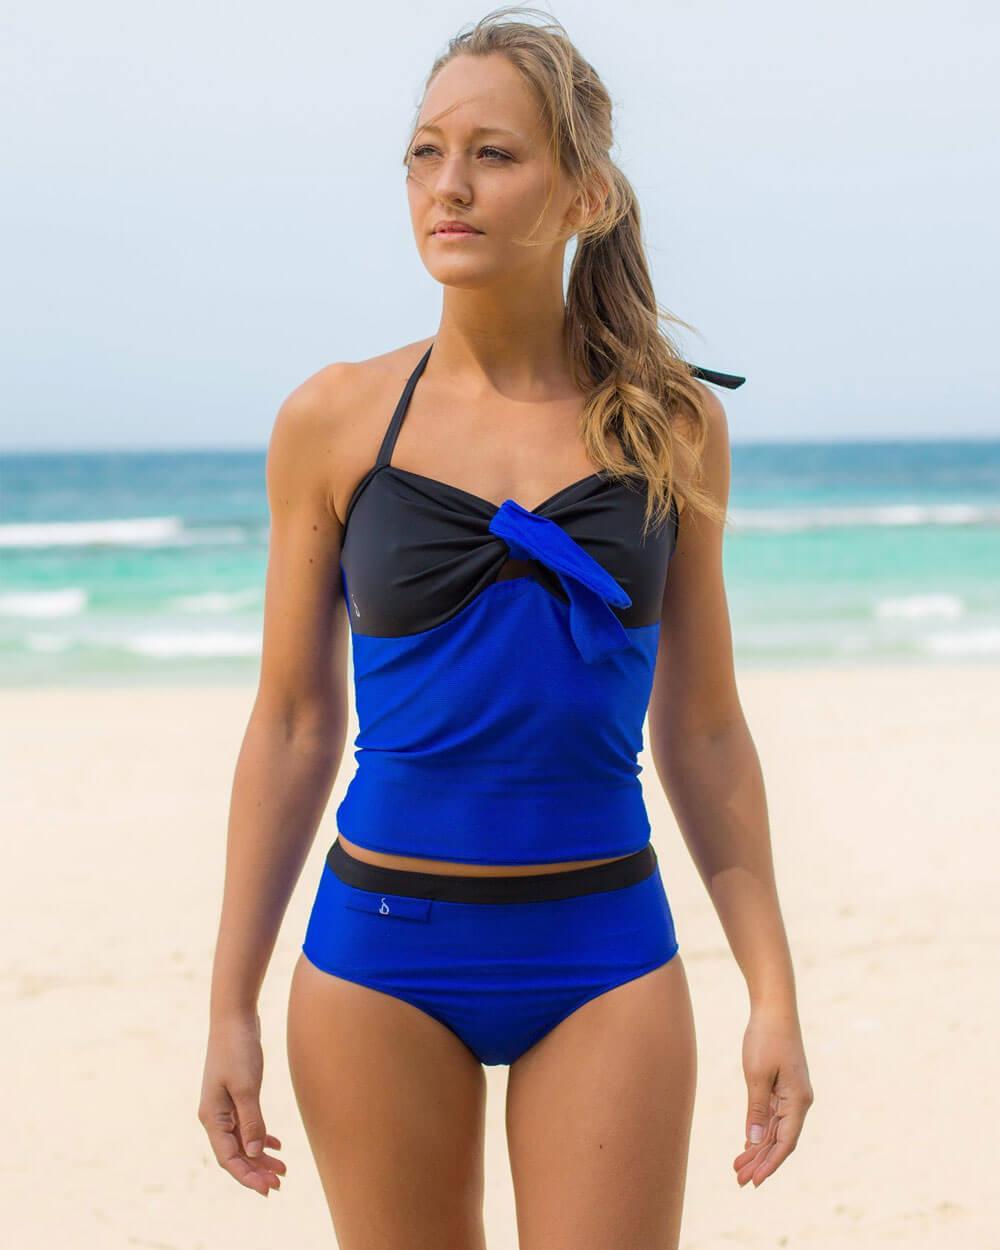 Neviano smart swimsuit